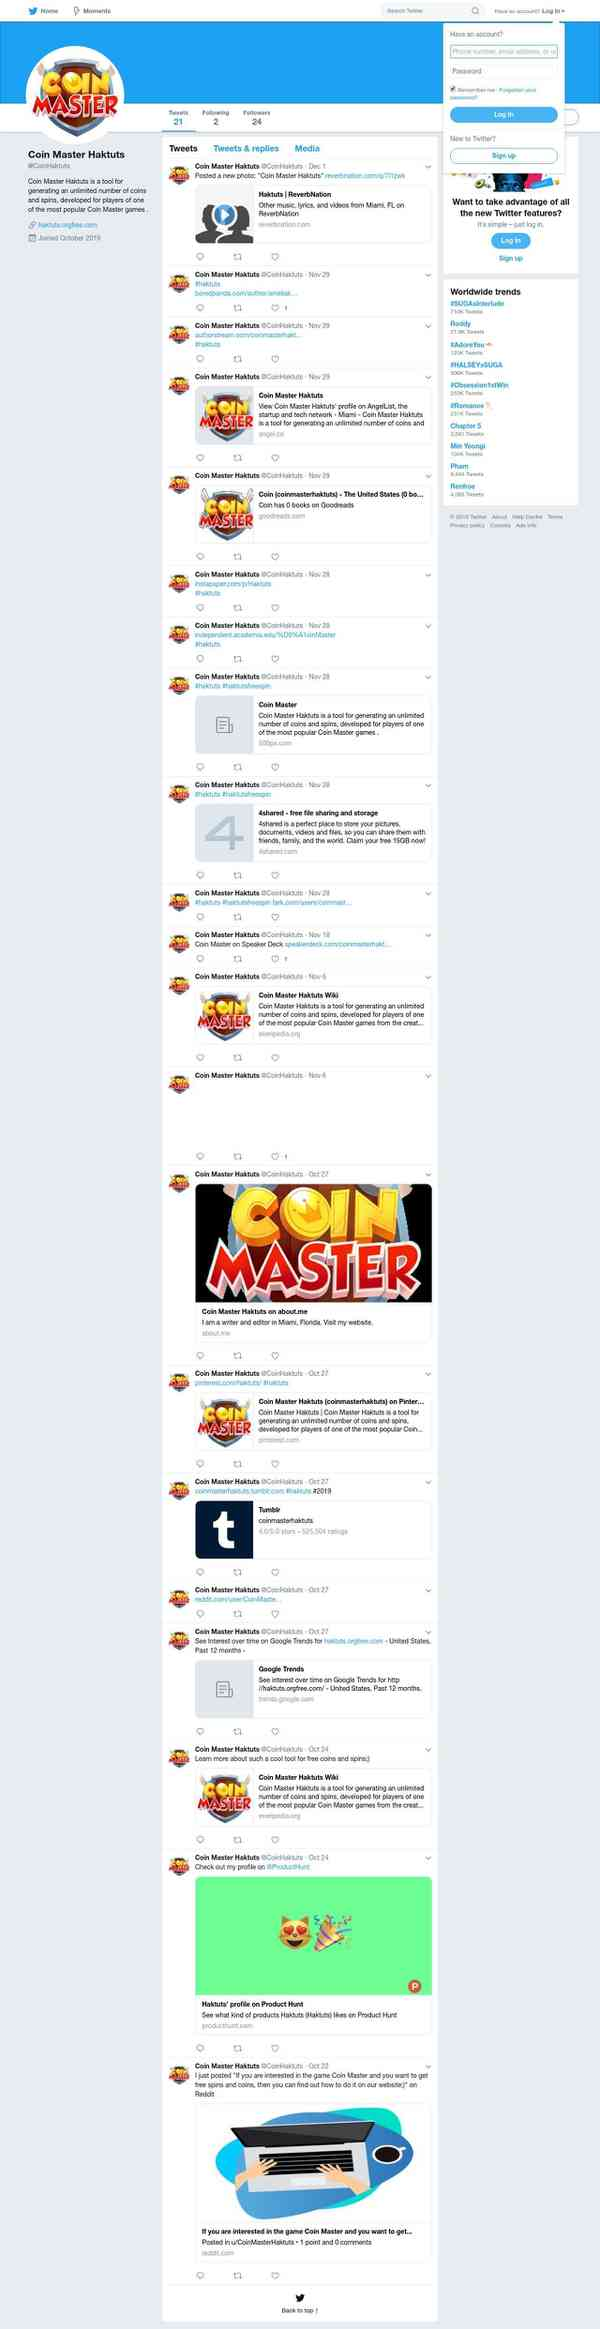 spin coin master haktuts.com